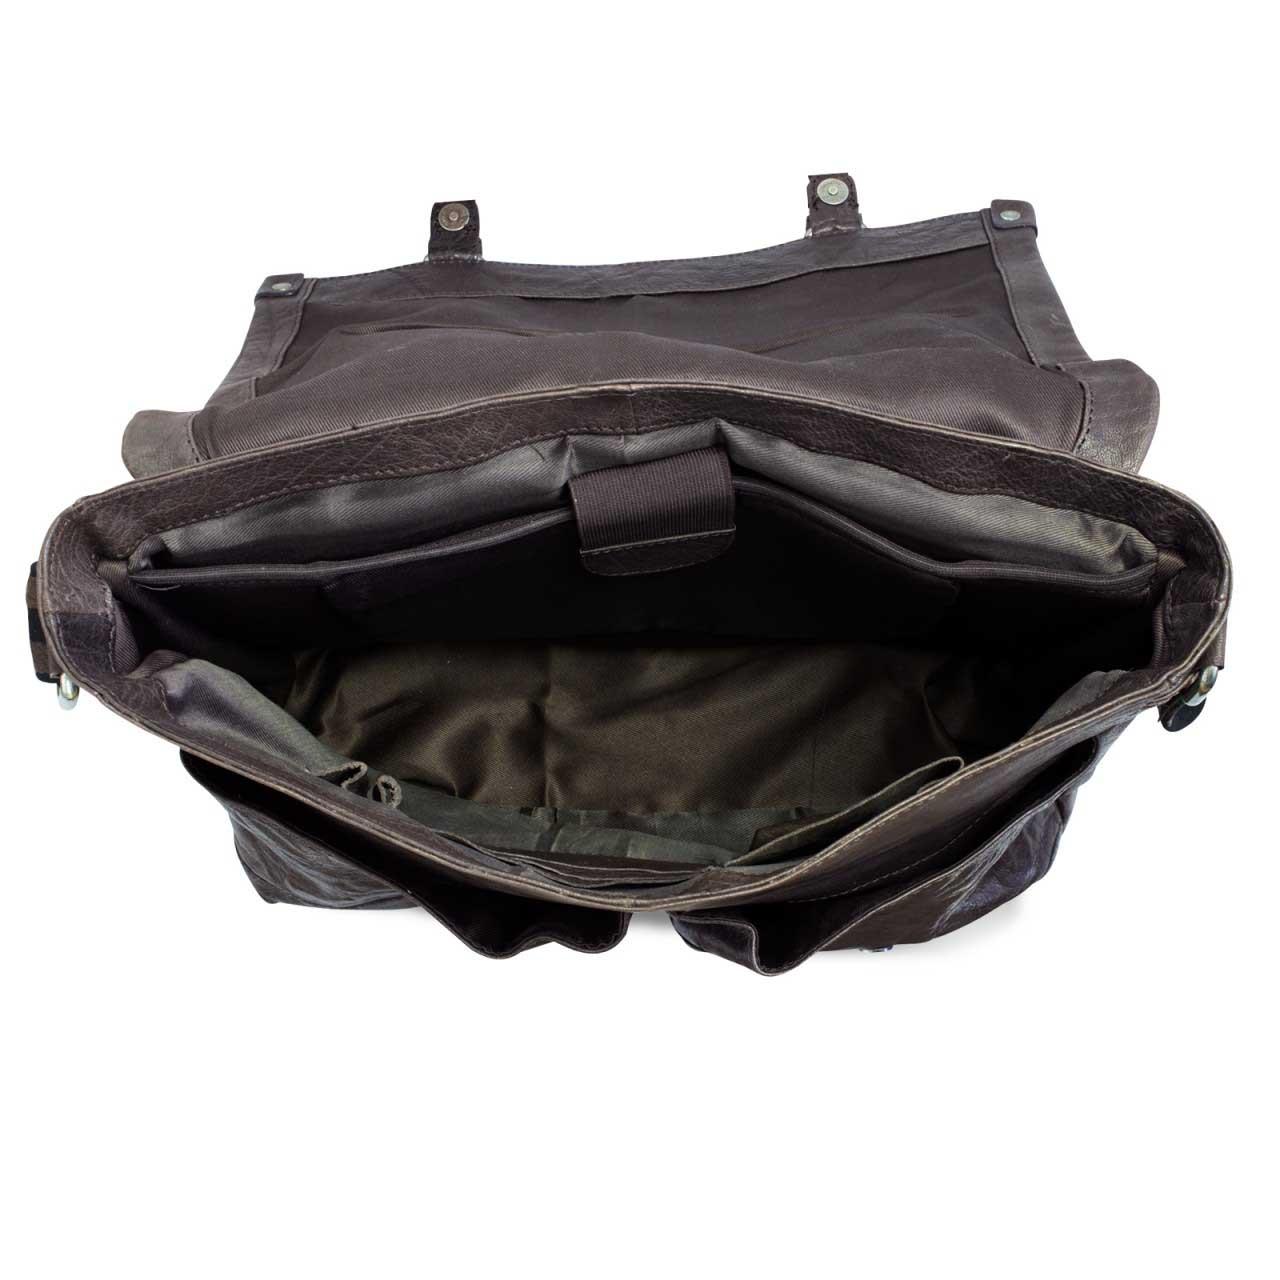 Geschenk Tasche Leder